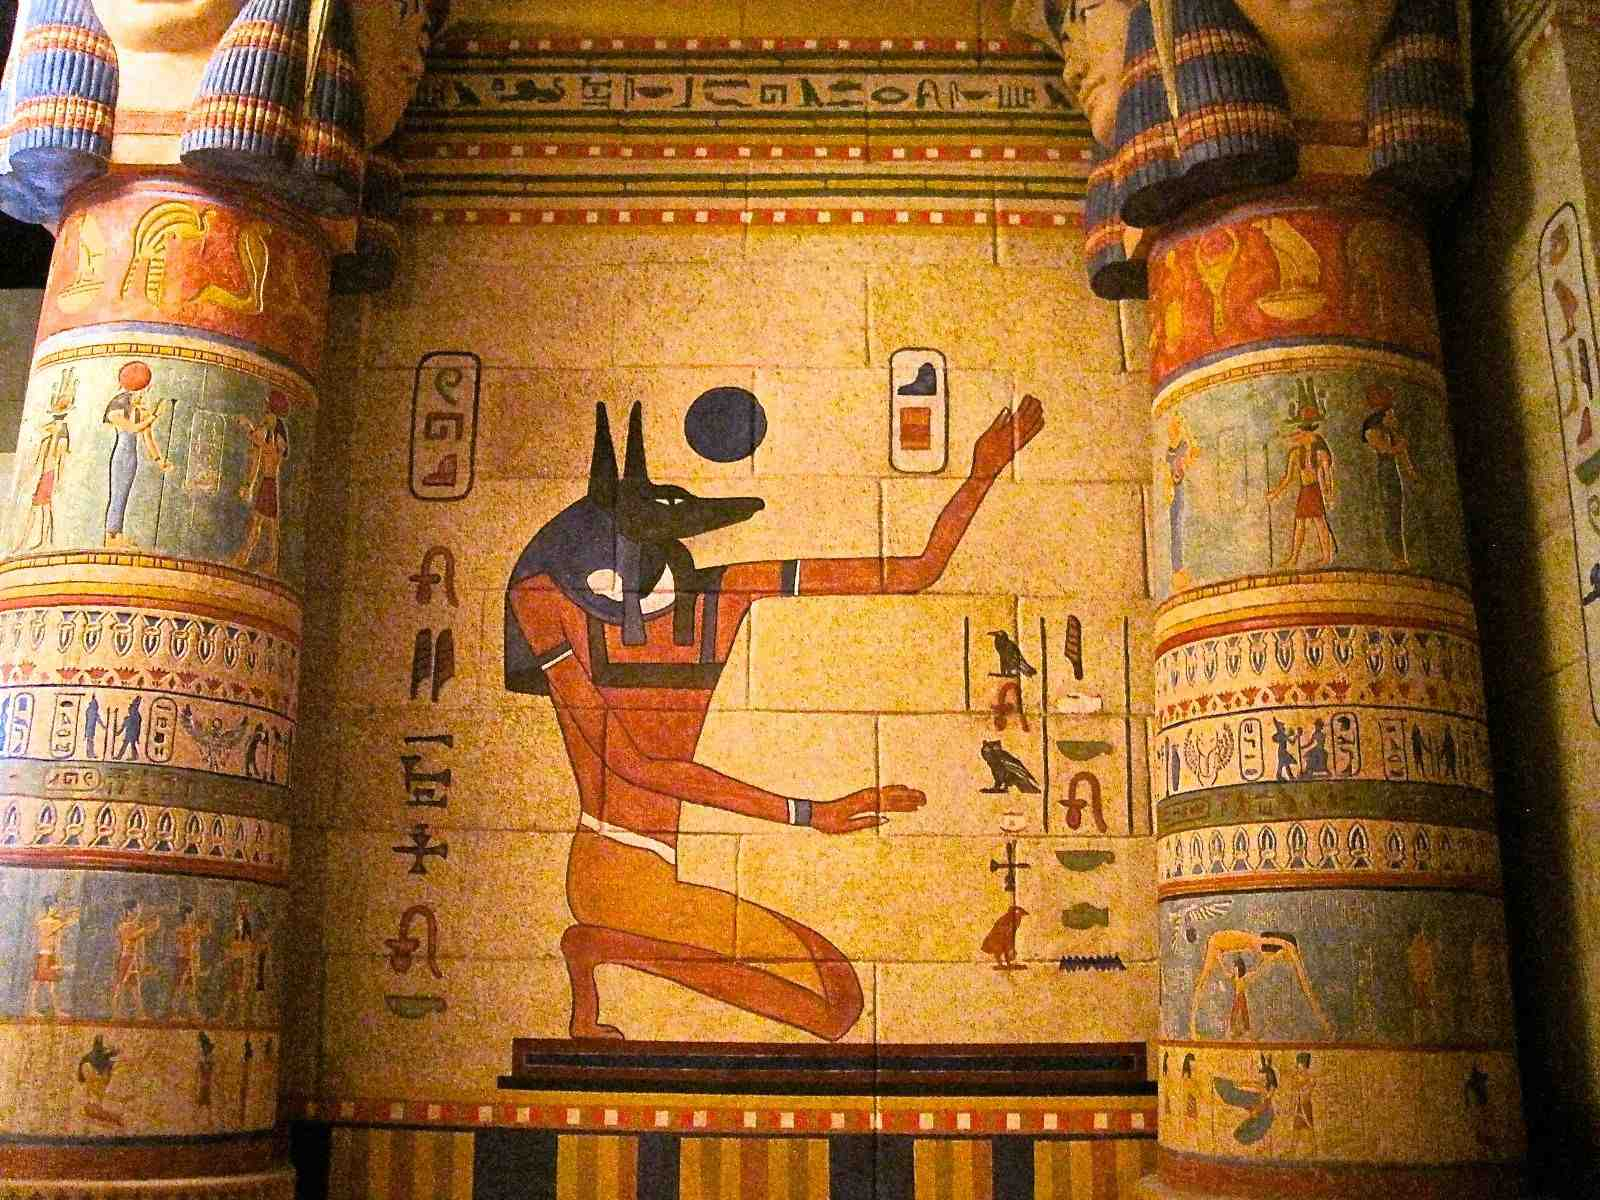 Egypt Pyramids Hd Wallpapers Missive From Morocco 3 Tug Of War Lyrasisms